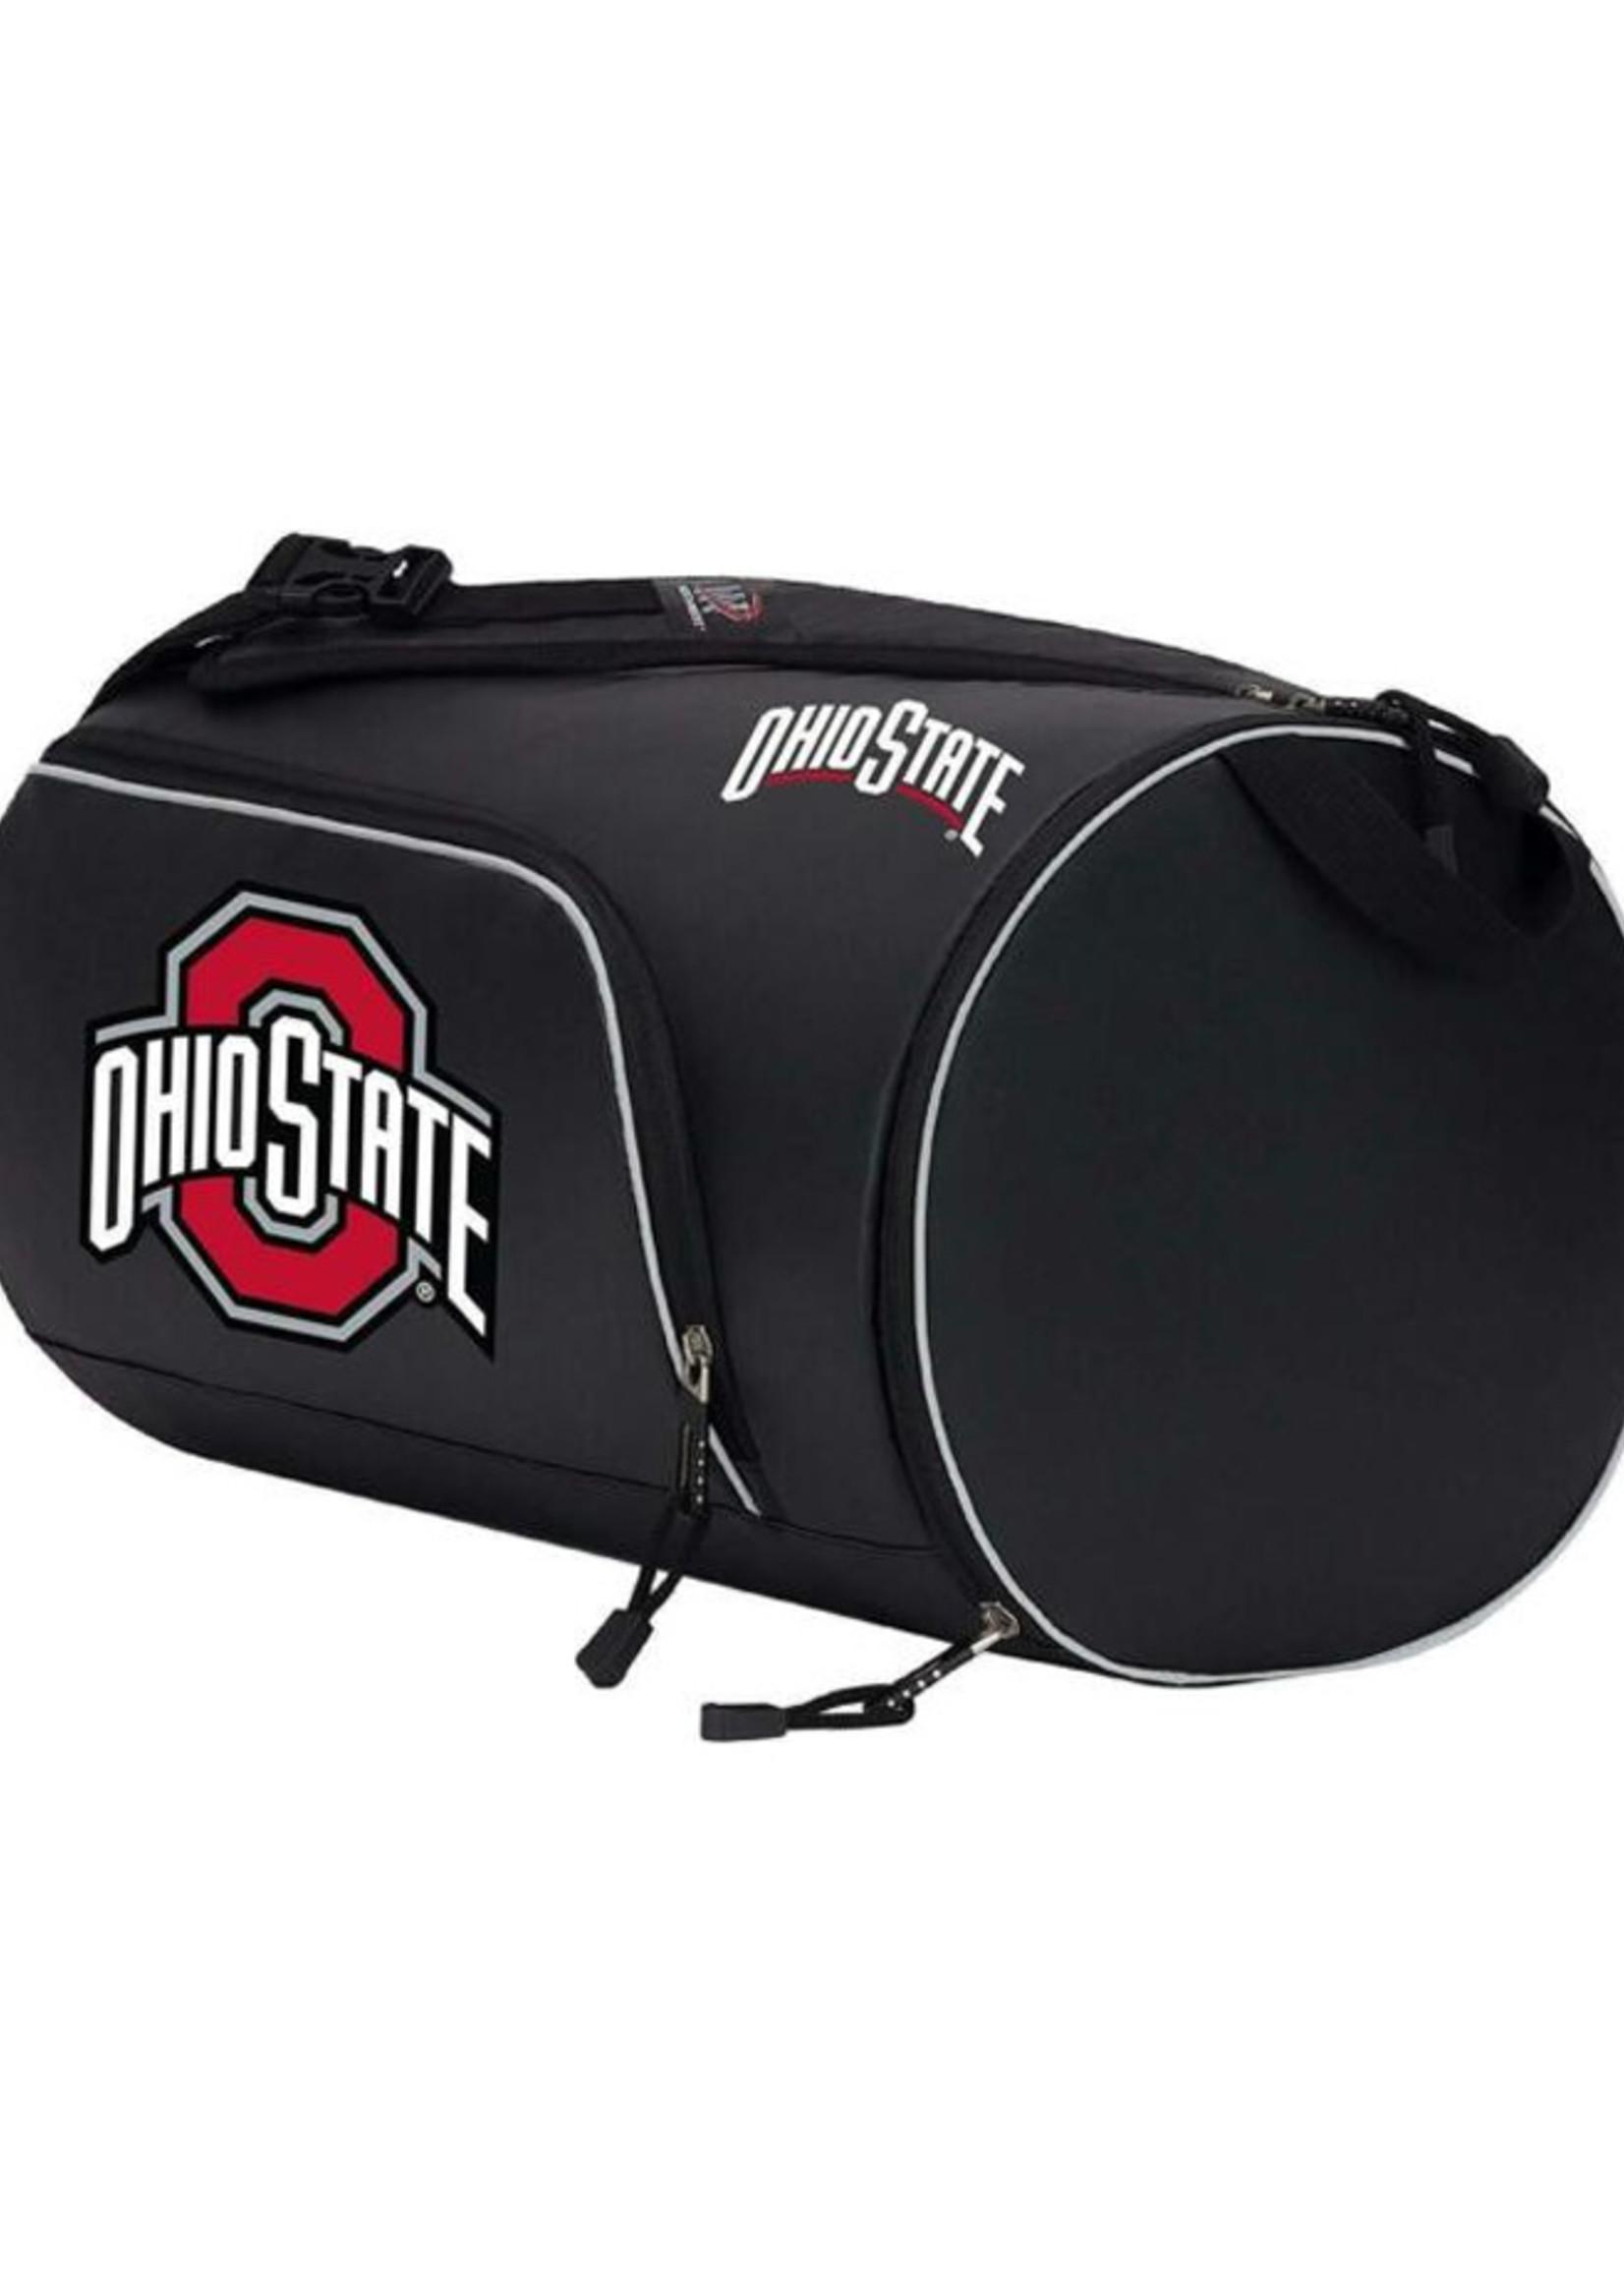 Ohio State University Squadron Duffle Bag